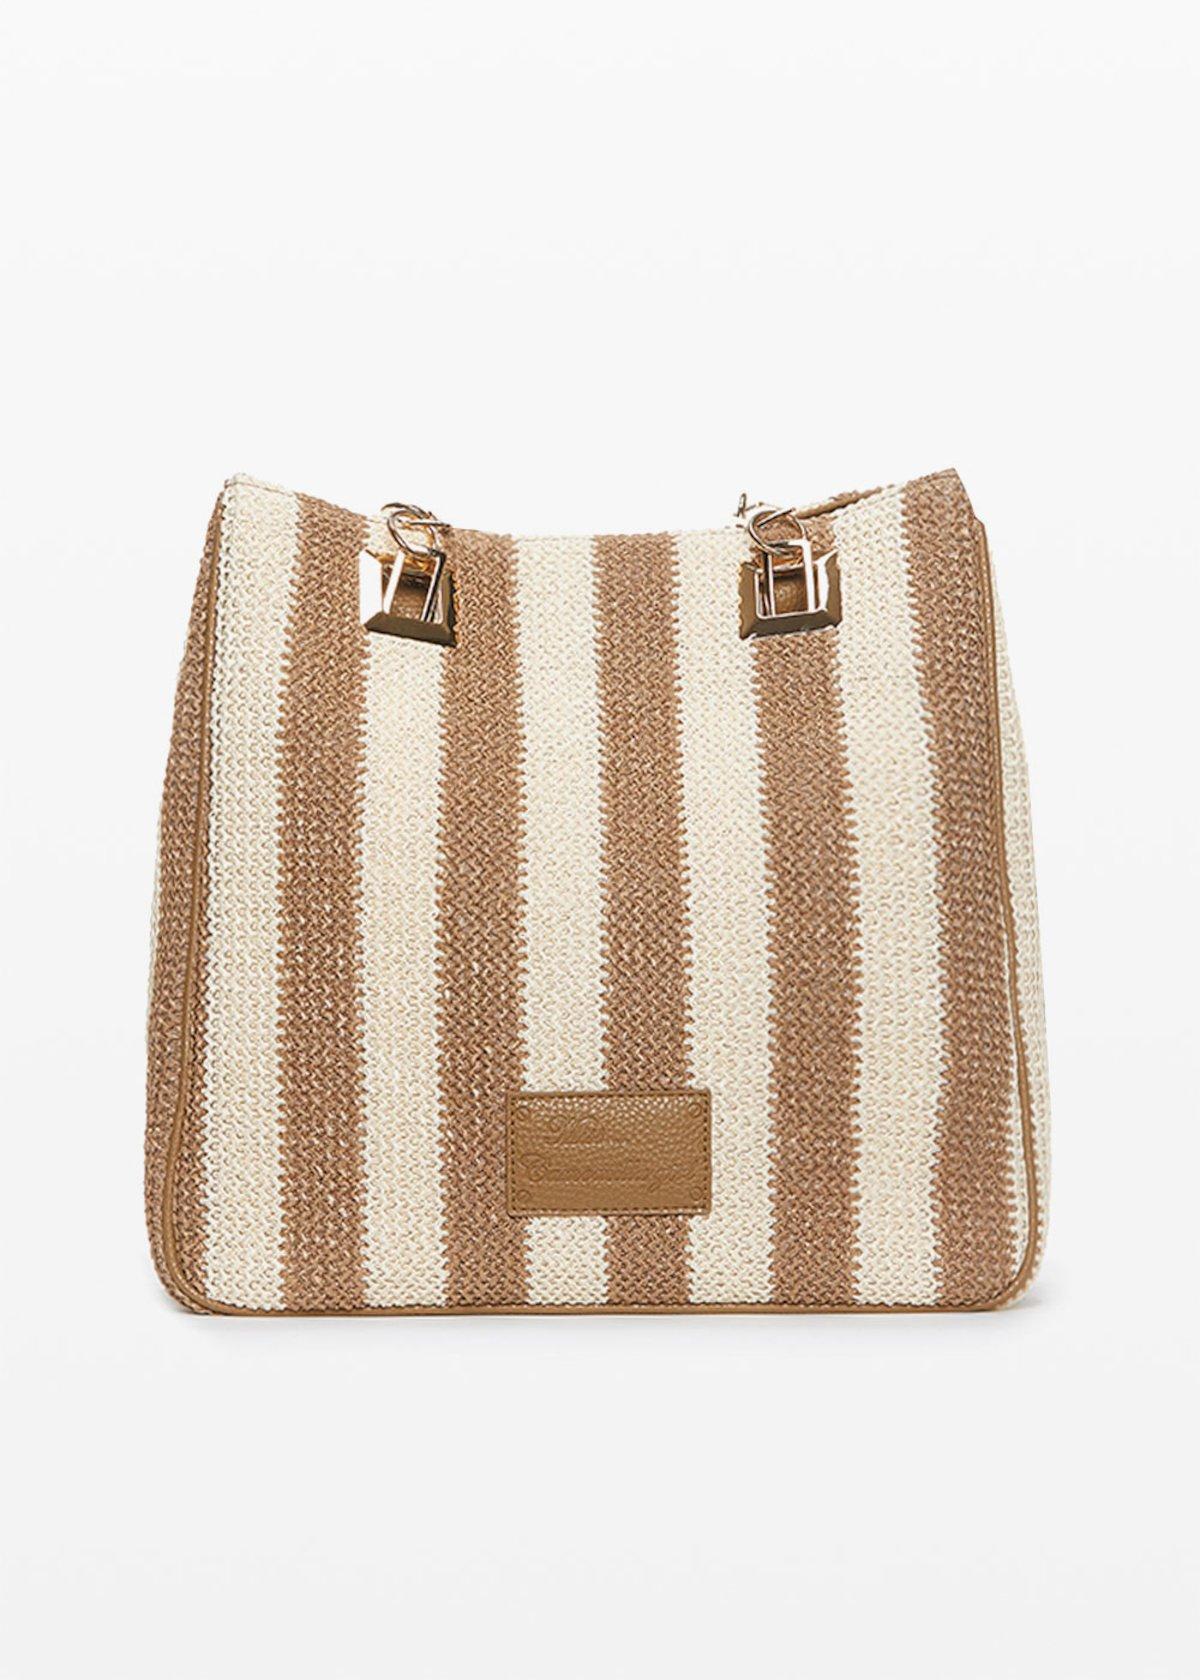 Mmissstri bag with stripes pattern - Desert / White Stripes - Woman